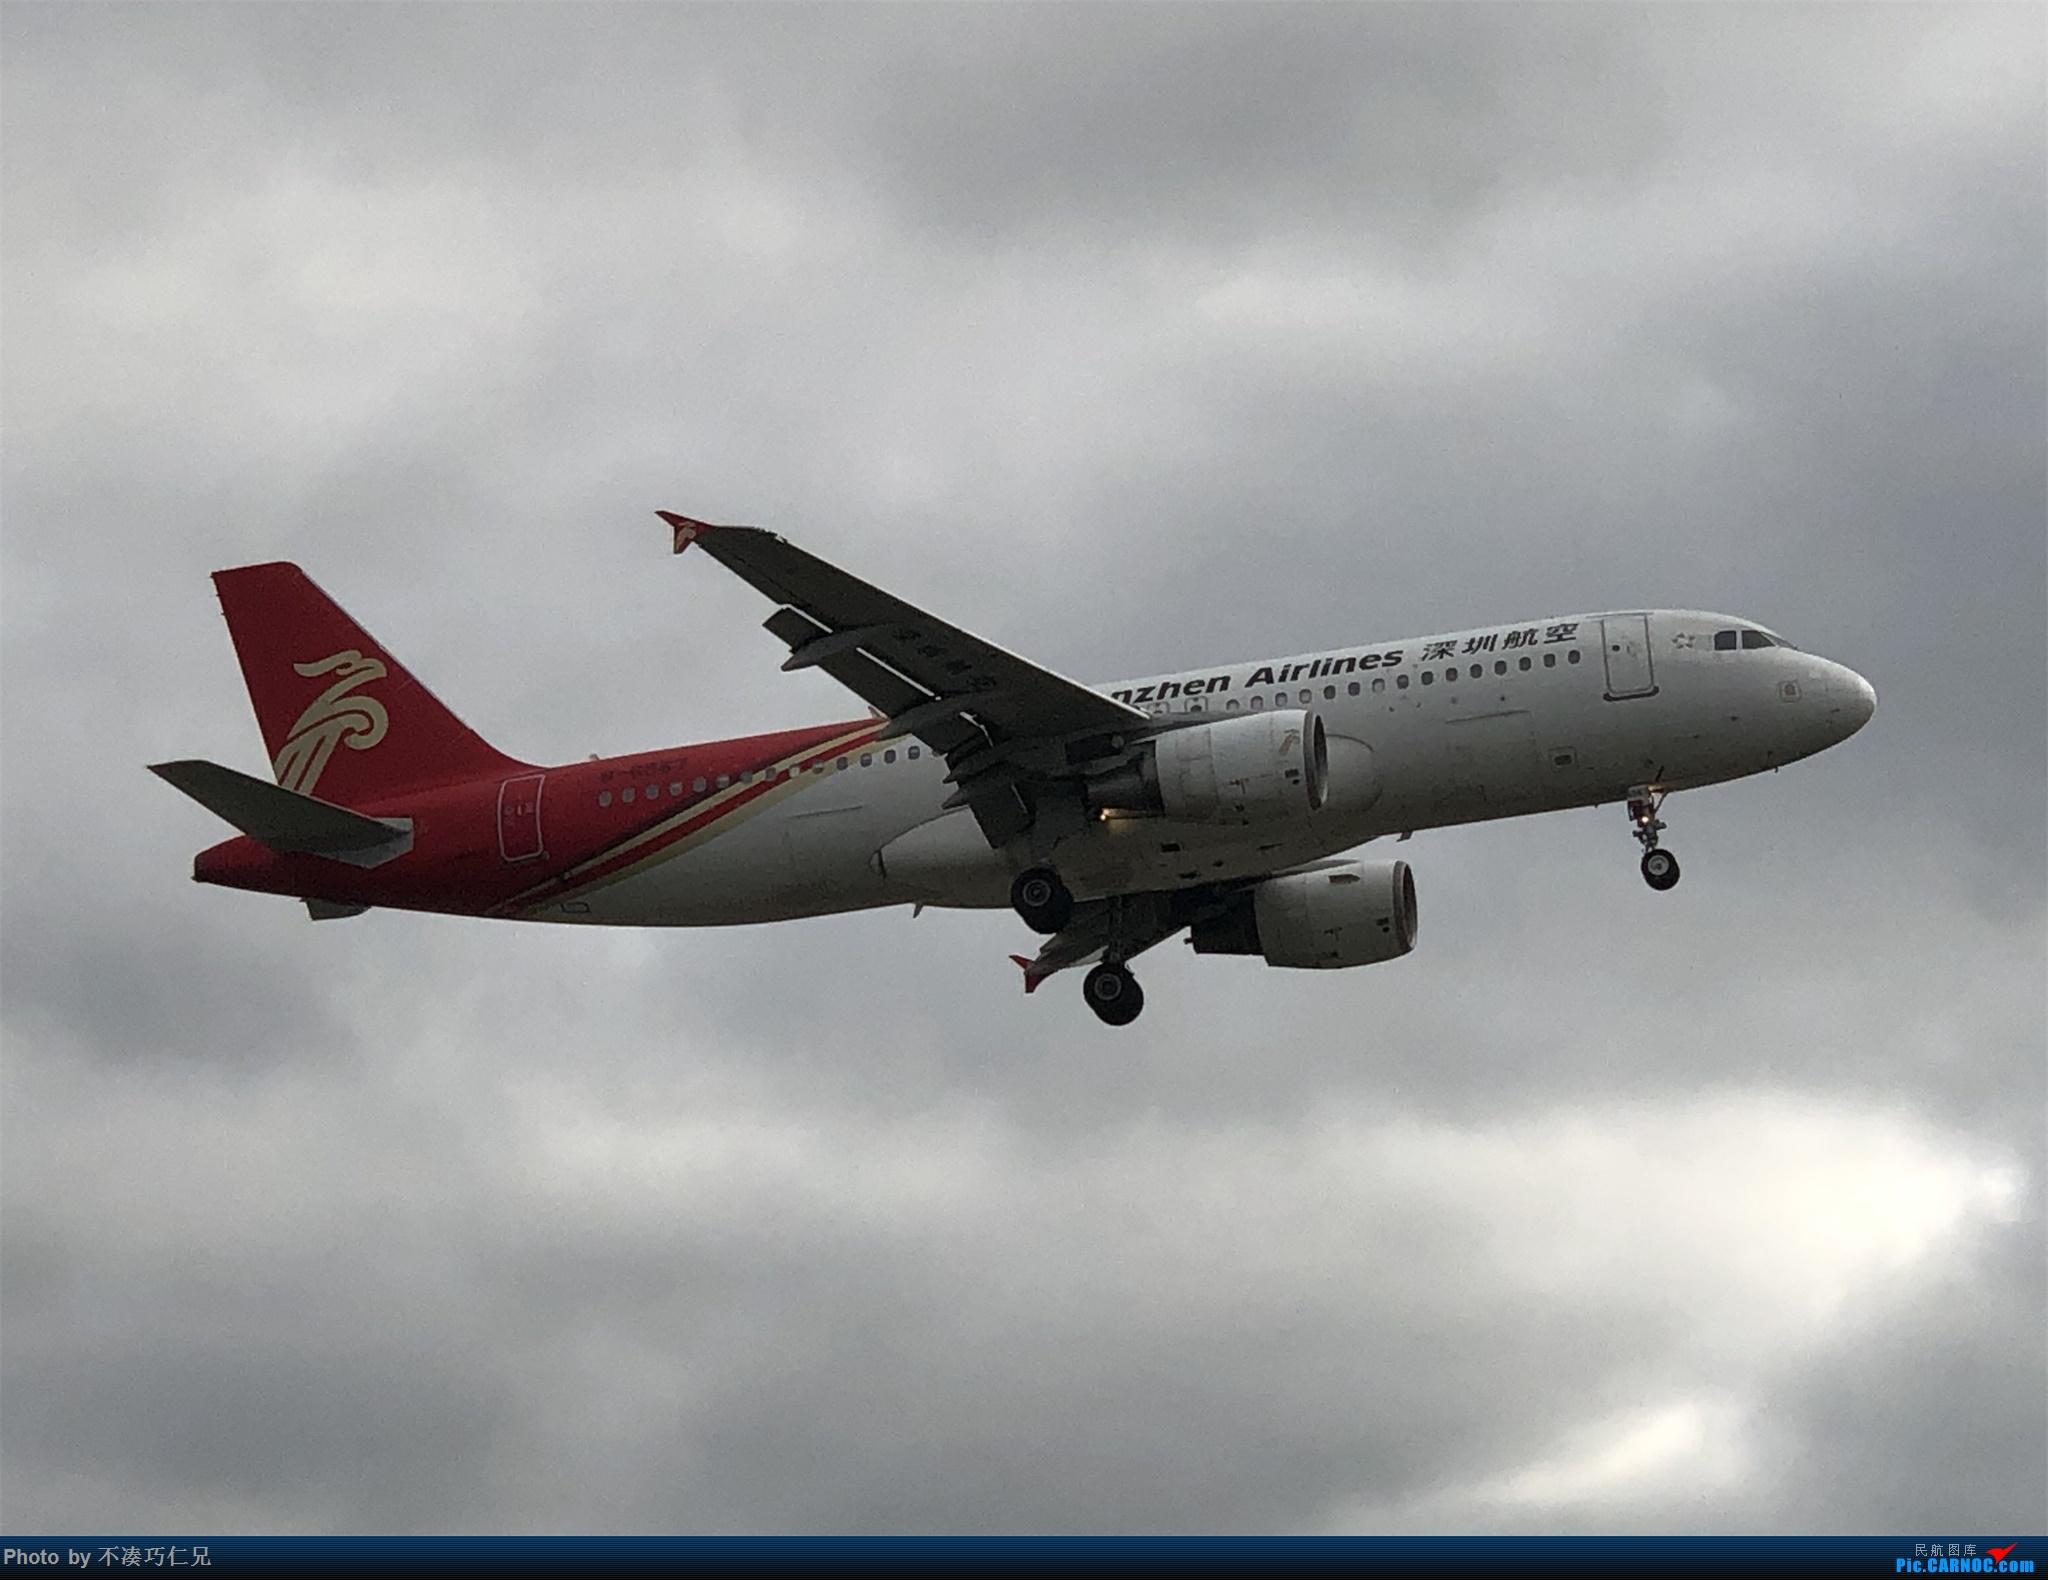 舟山机场附近拍机 AIRBUS A320-200 B-6857 舟山机场附近